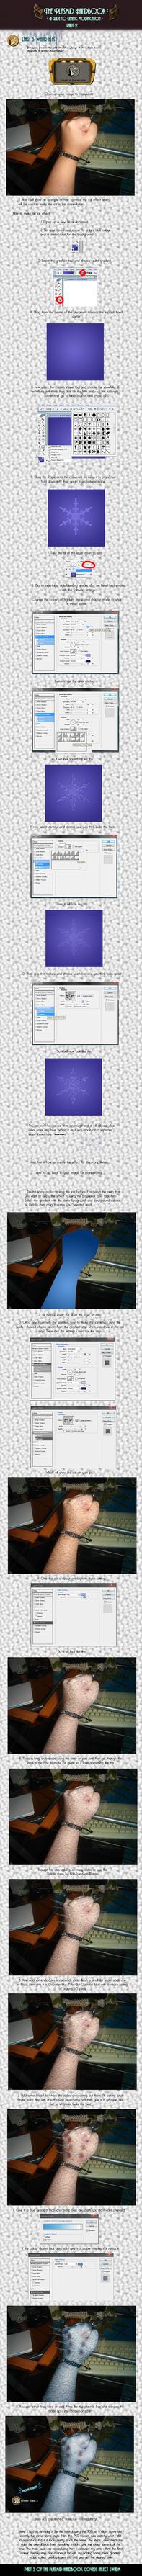 The Plasmid Handbook: Part 2 by RedDevil00